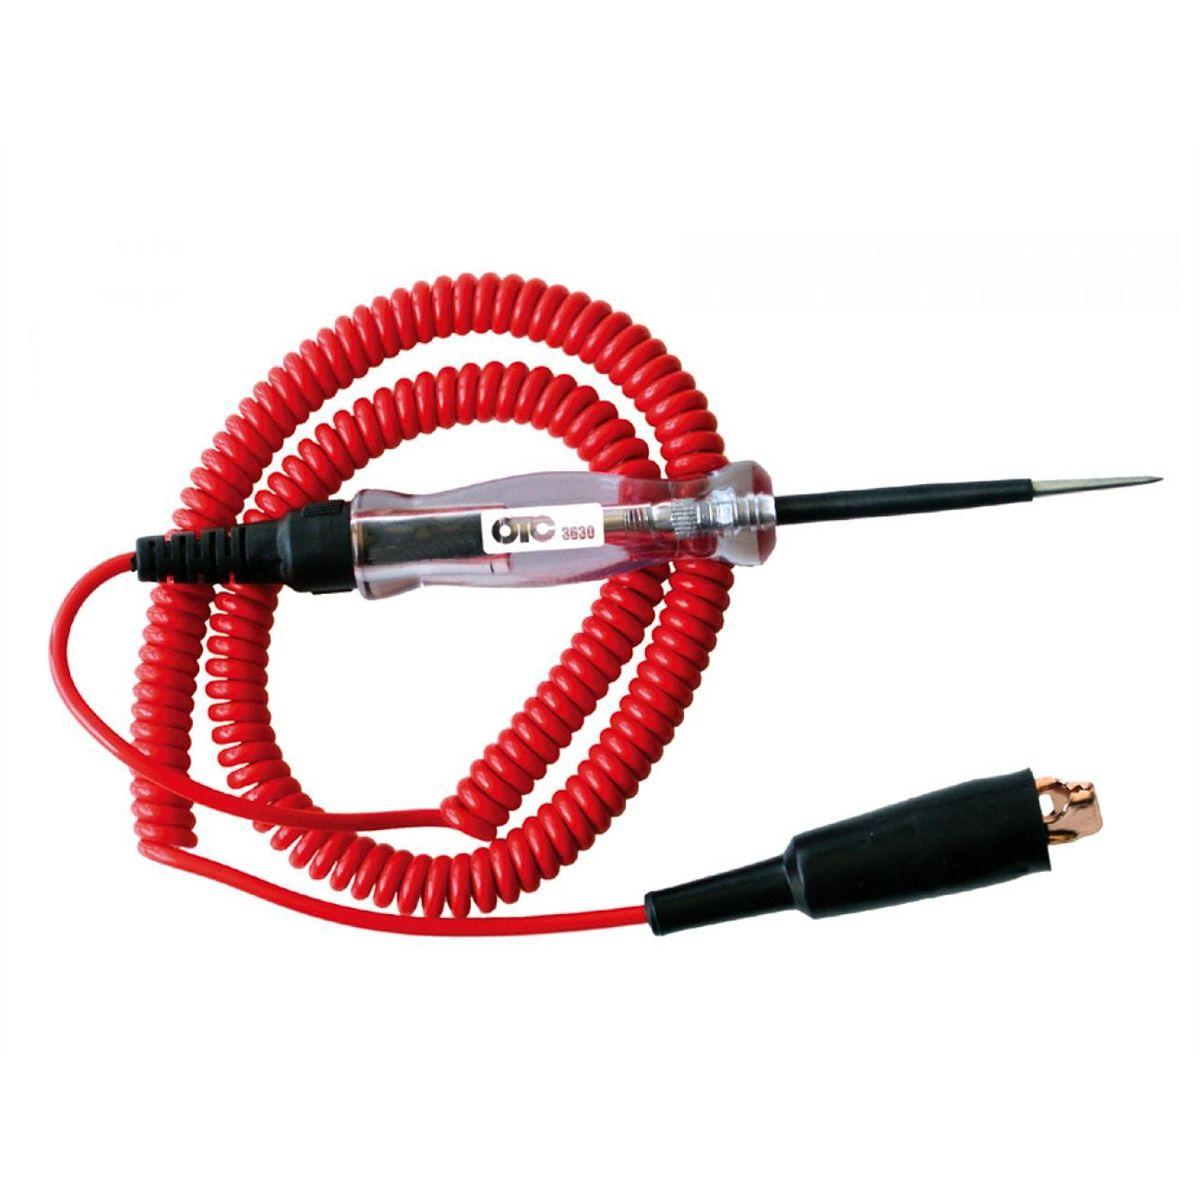 OTC 3630 Battery Powered Continuity Tester OTC3630